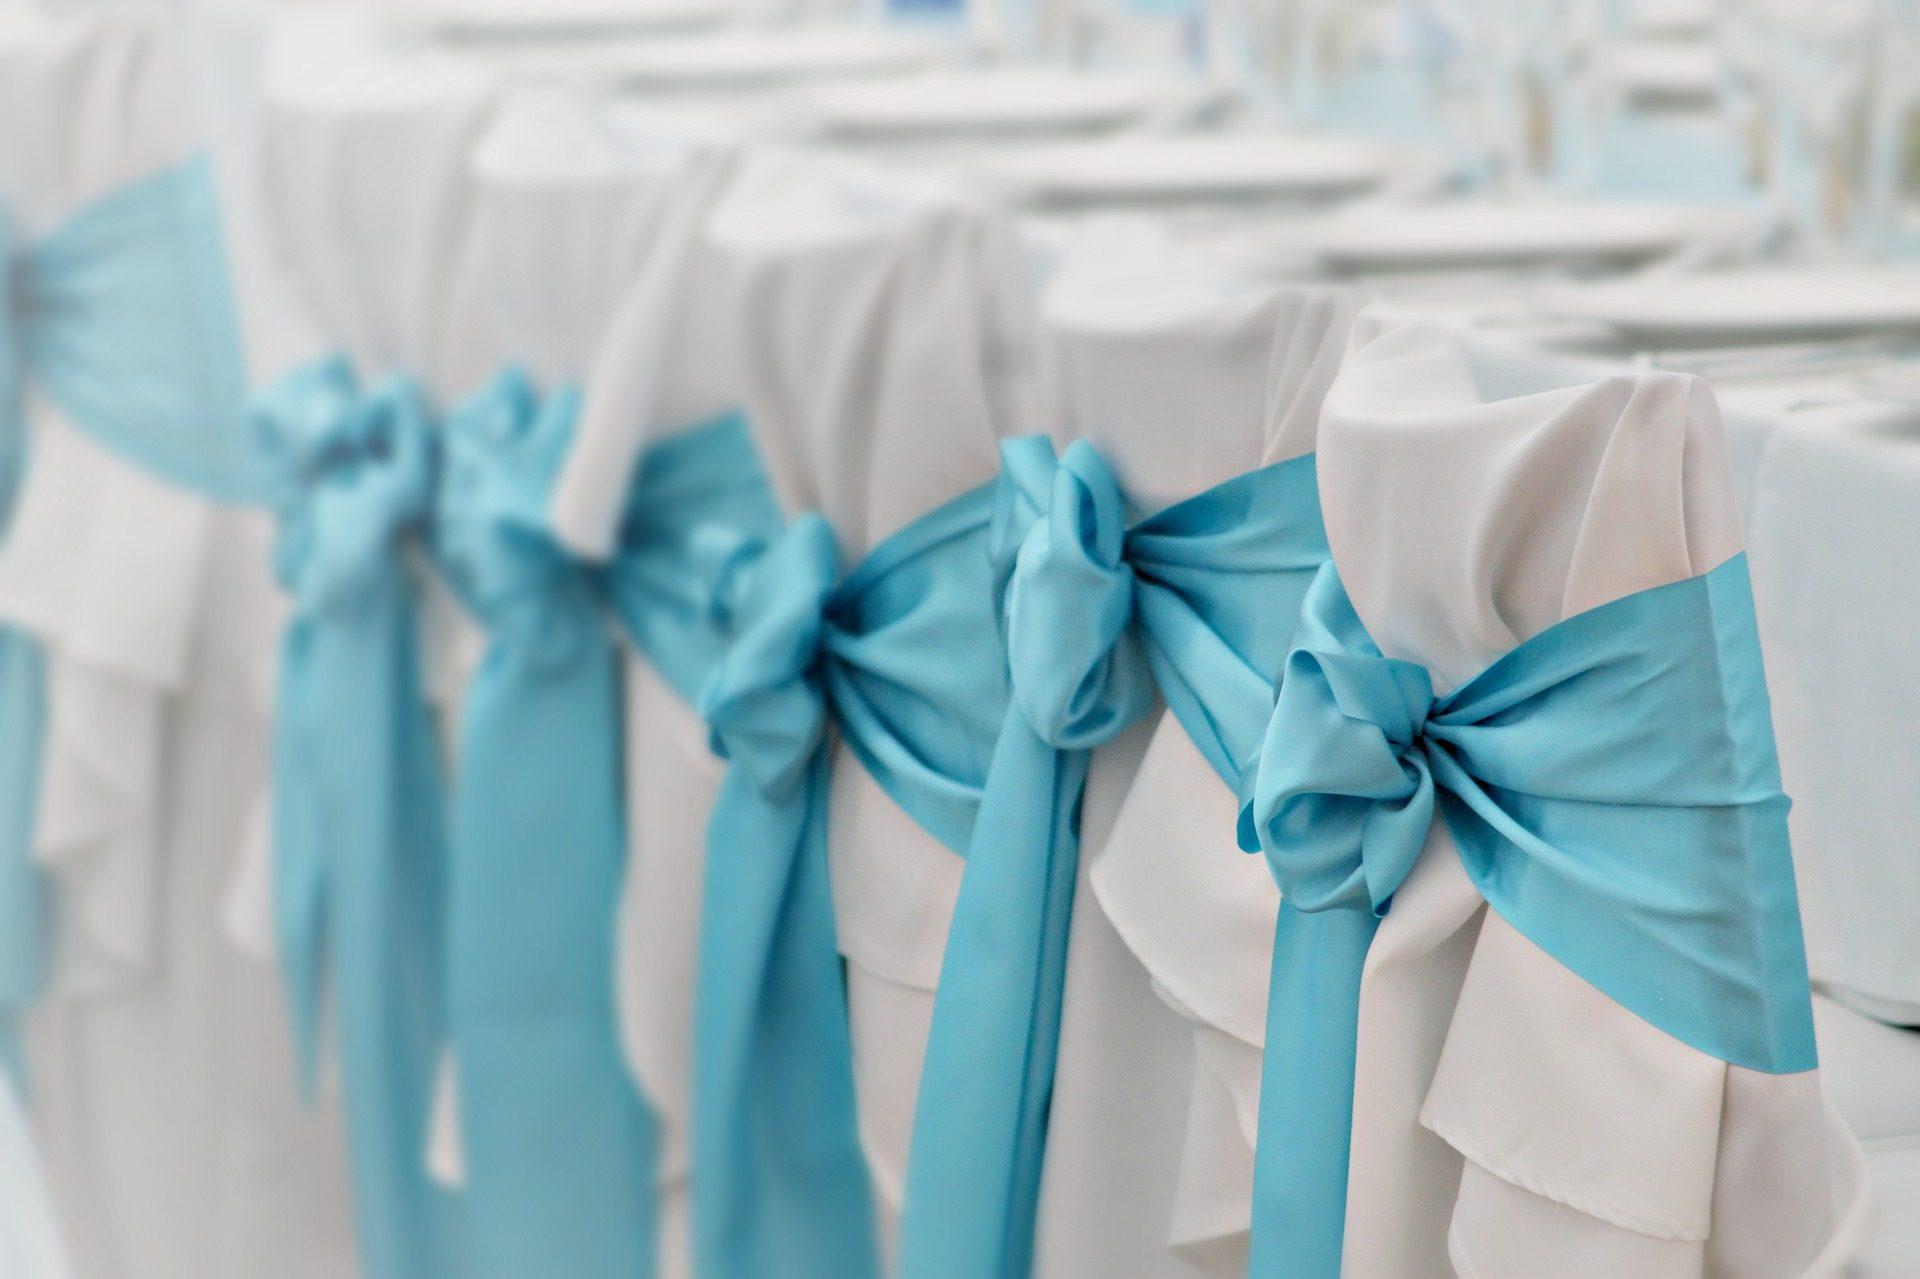 boda, ceremonia, mesa, sillas, lazos - Fondos de Pantalla HD - professor-falken.com